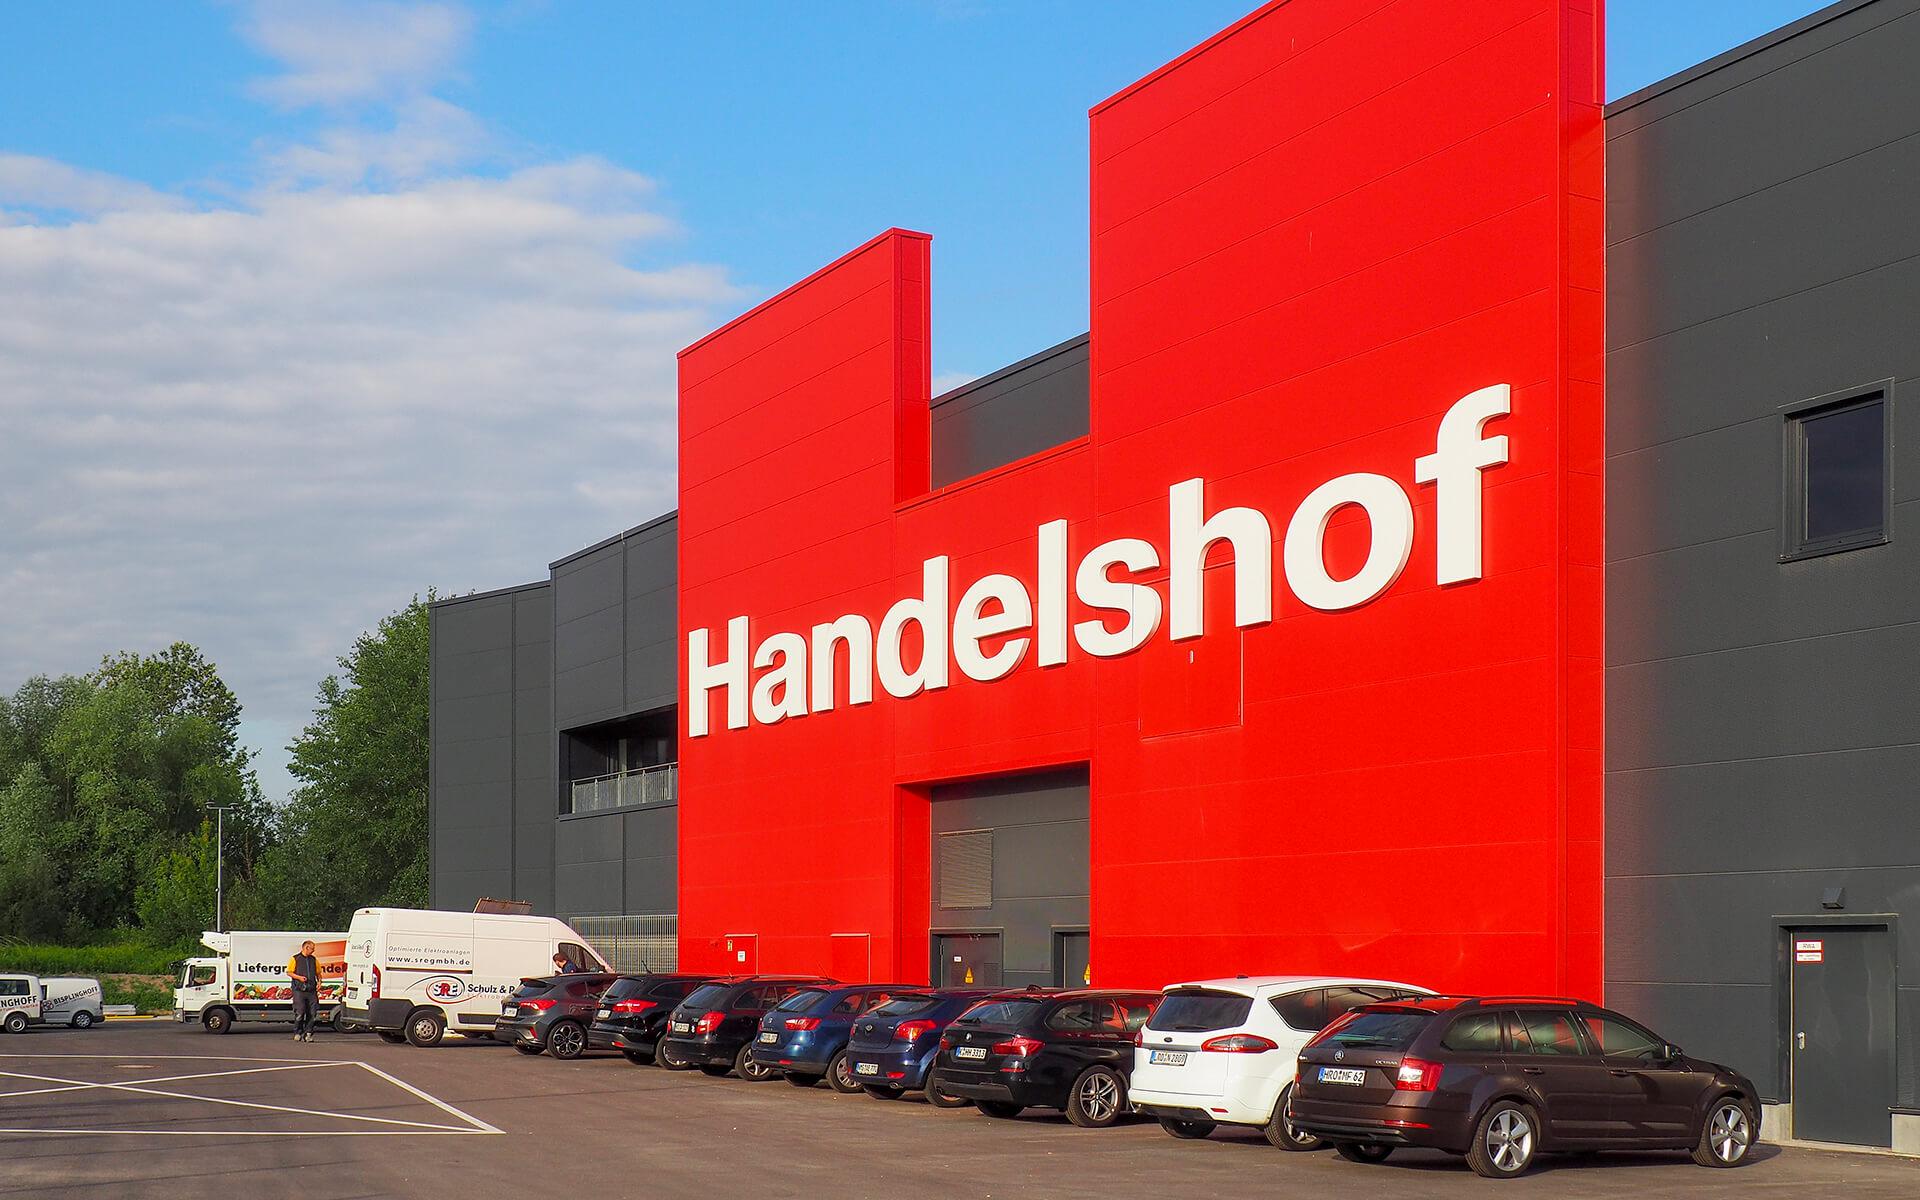 Handelshof Rostock Fassade Werbung